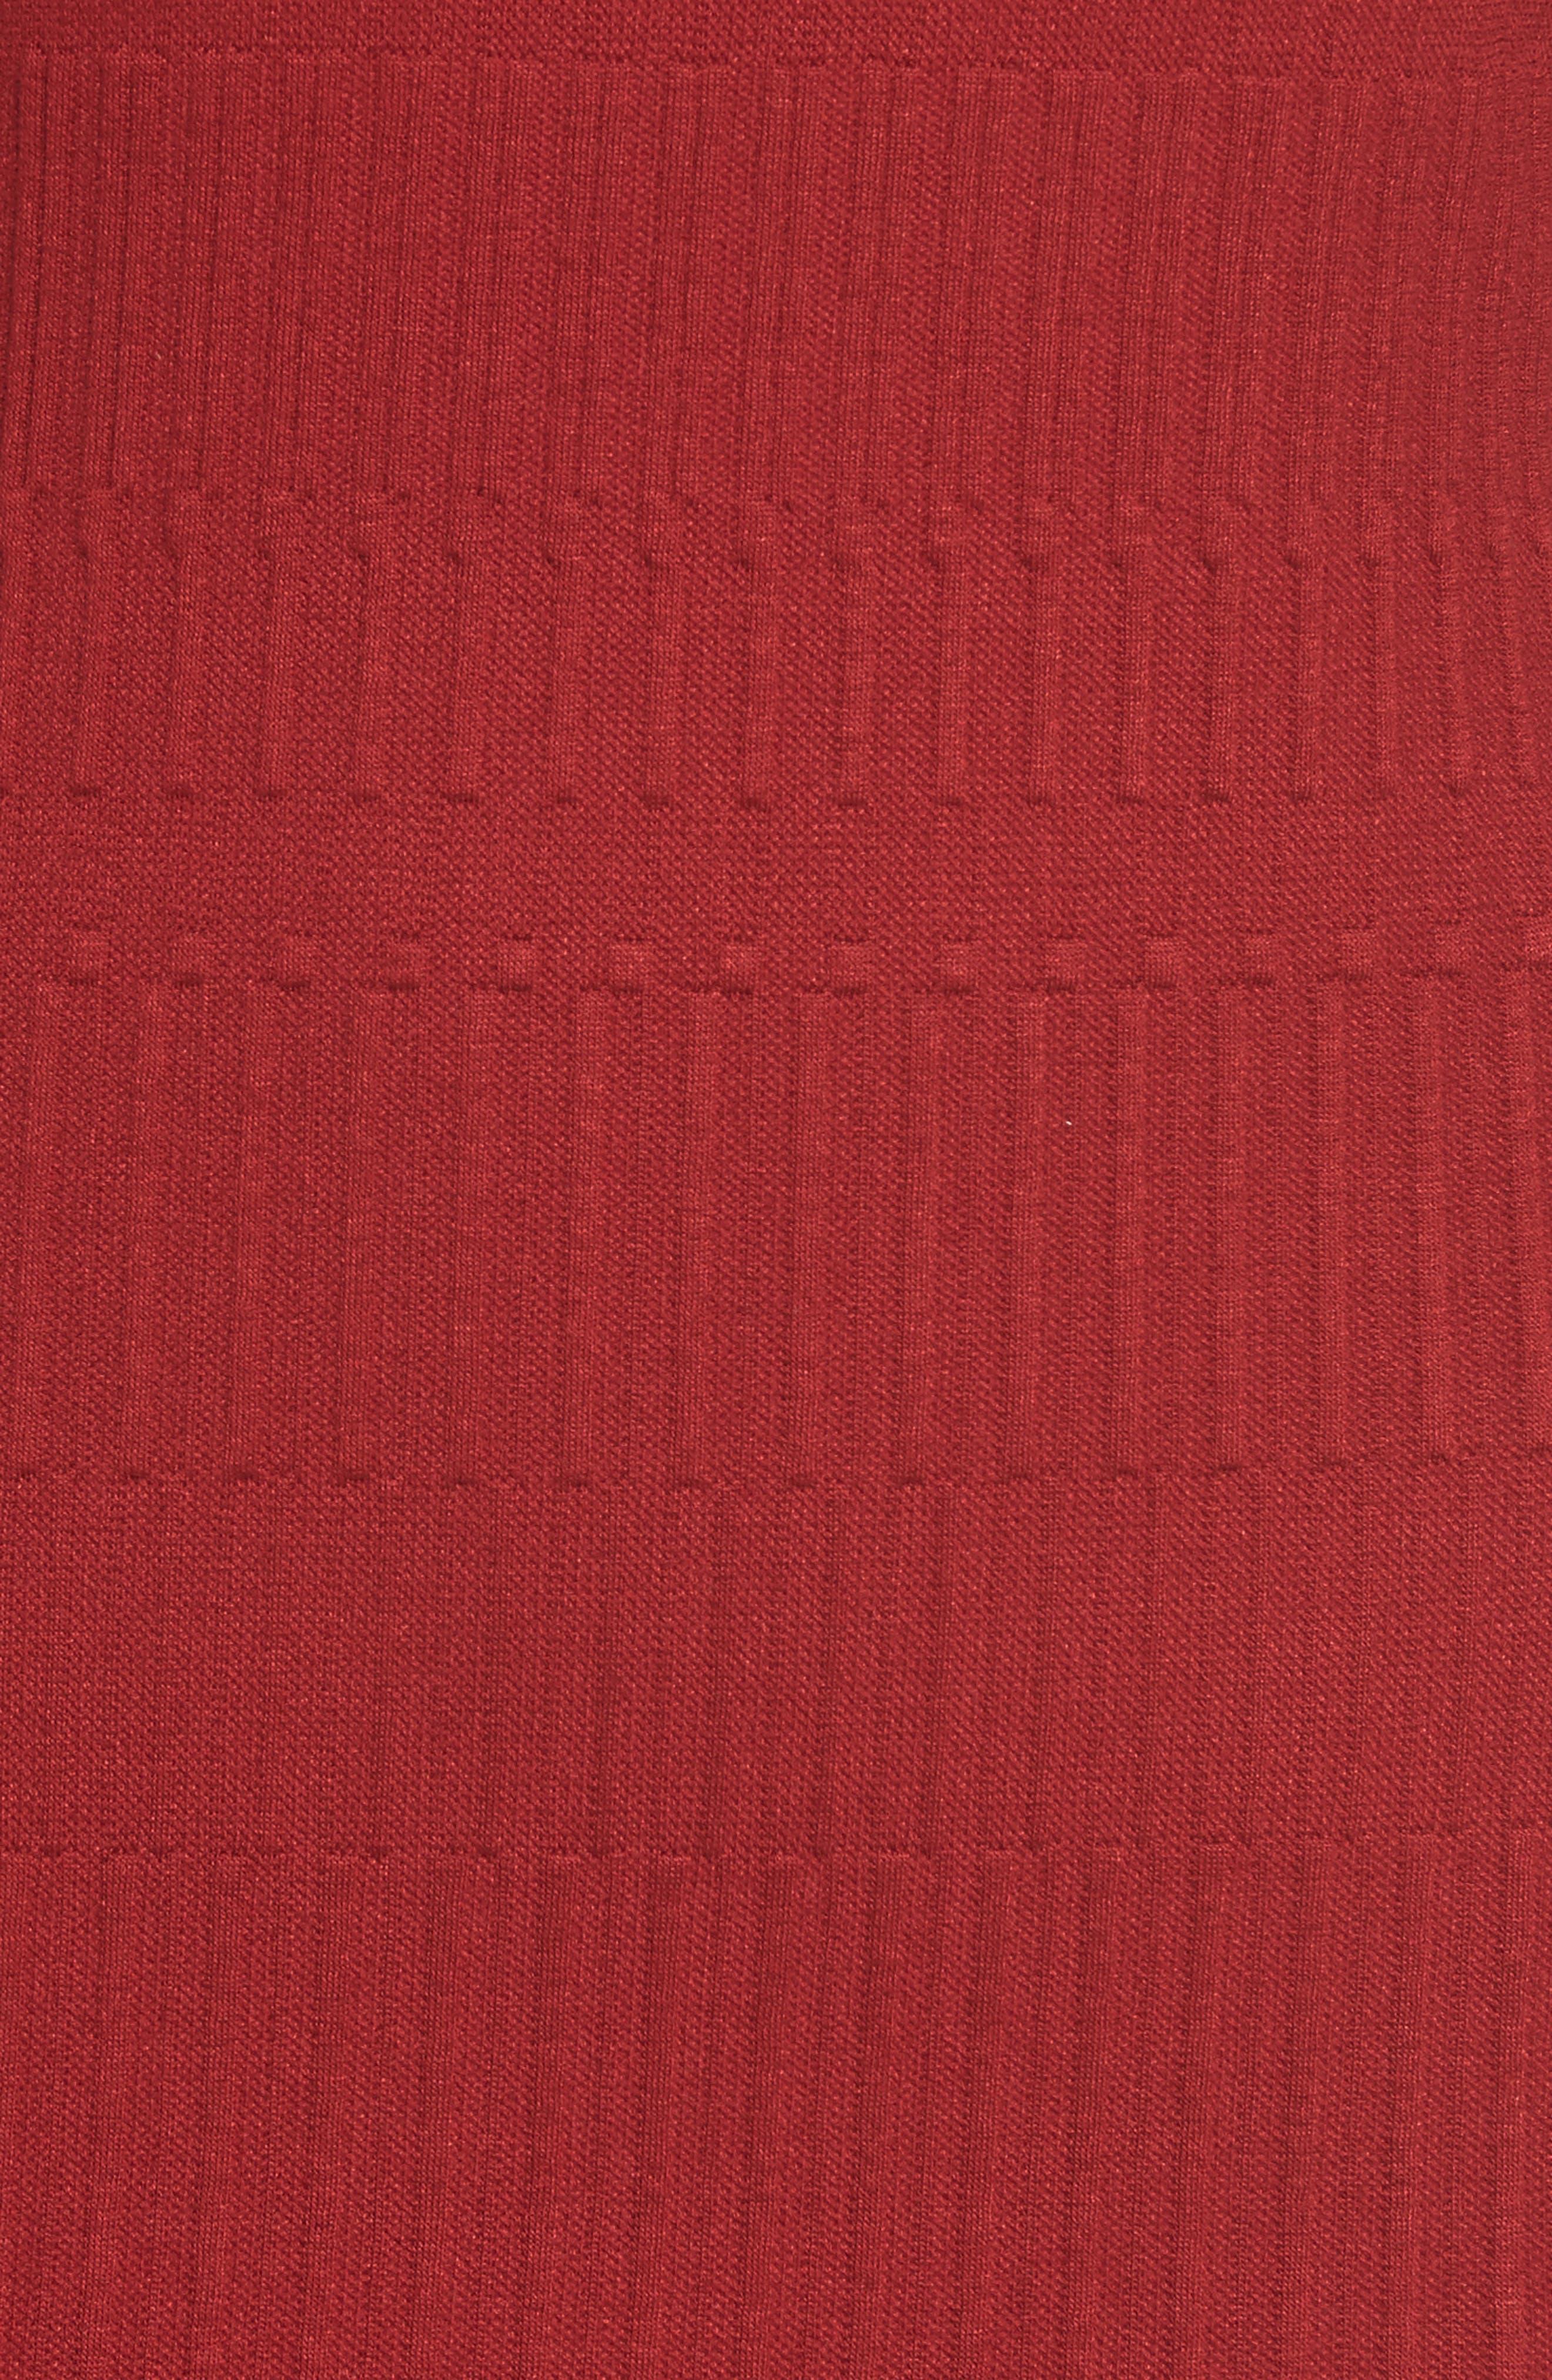 Hadea Knit Sheath Dress,                             Alternate thumbnail 5, color,                             619